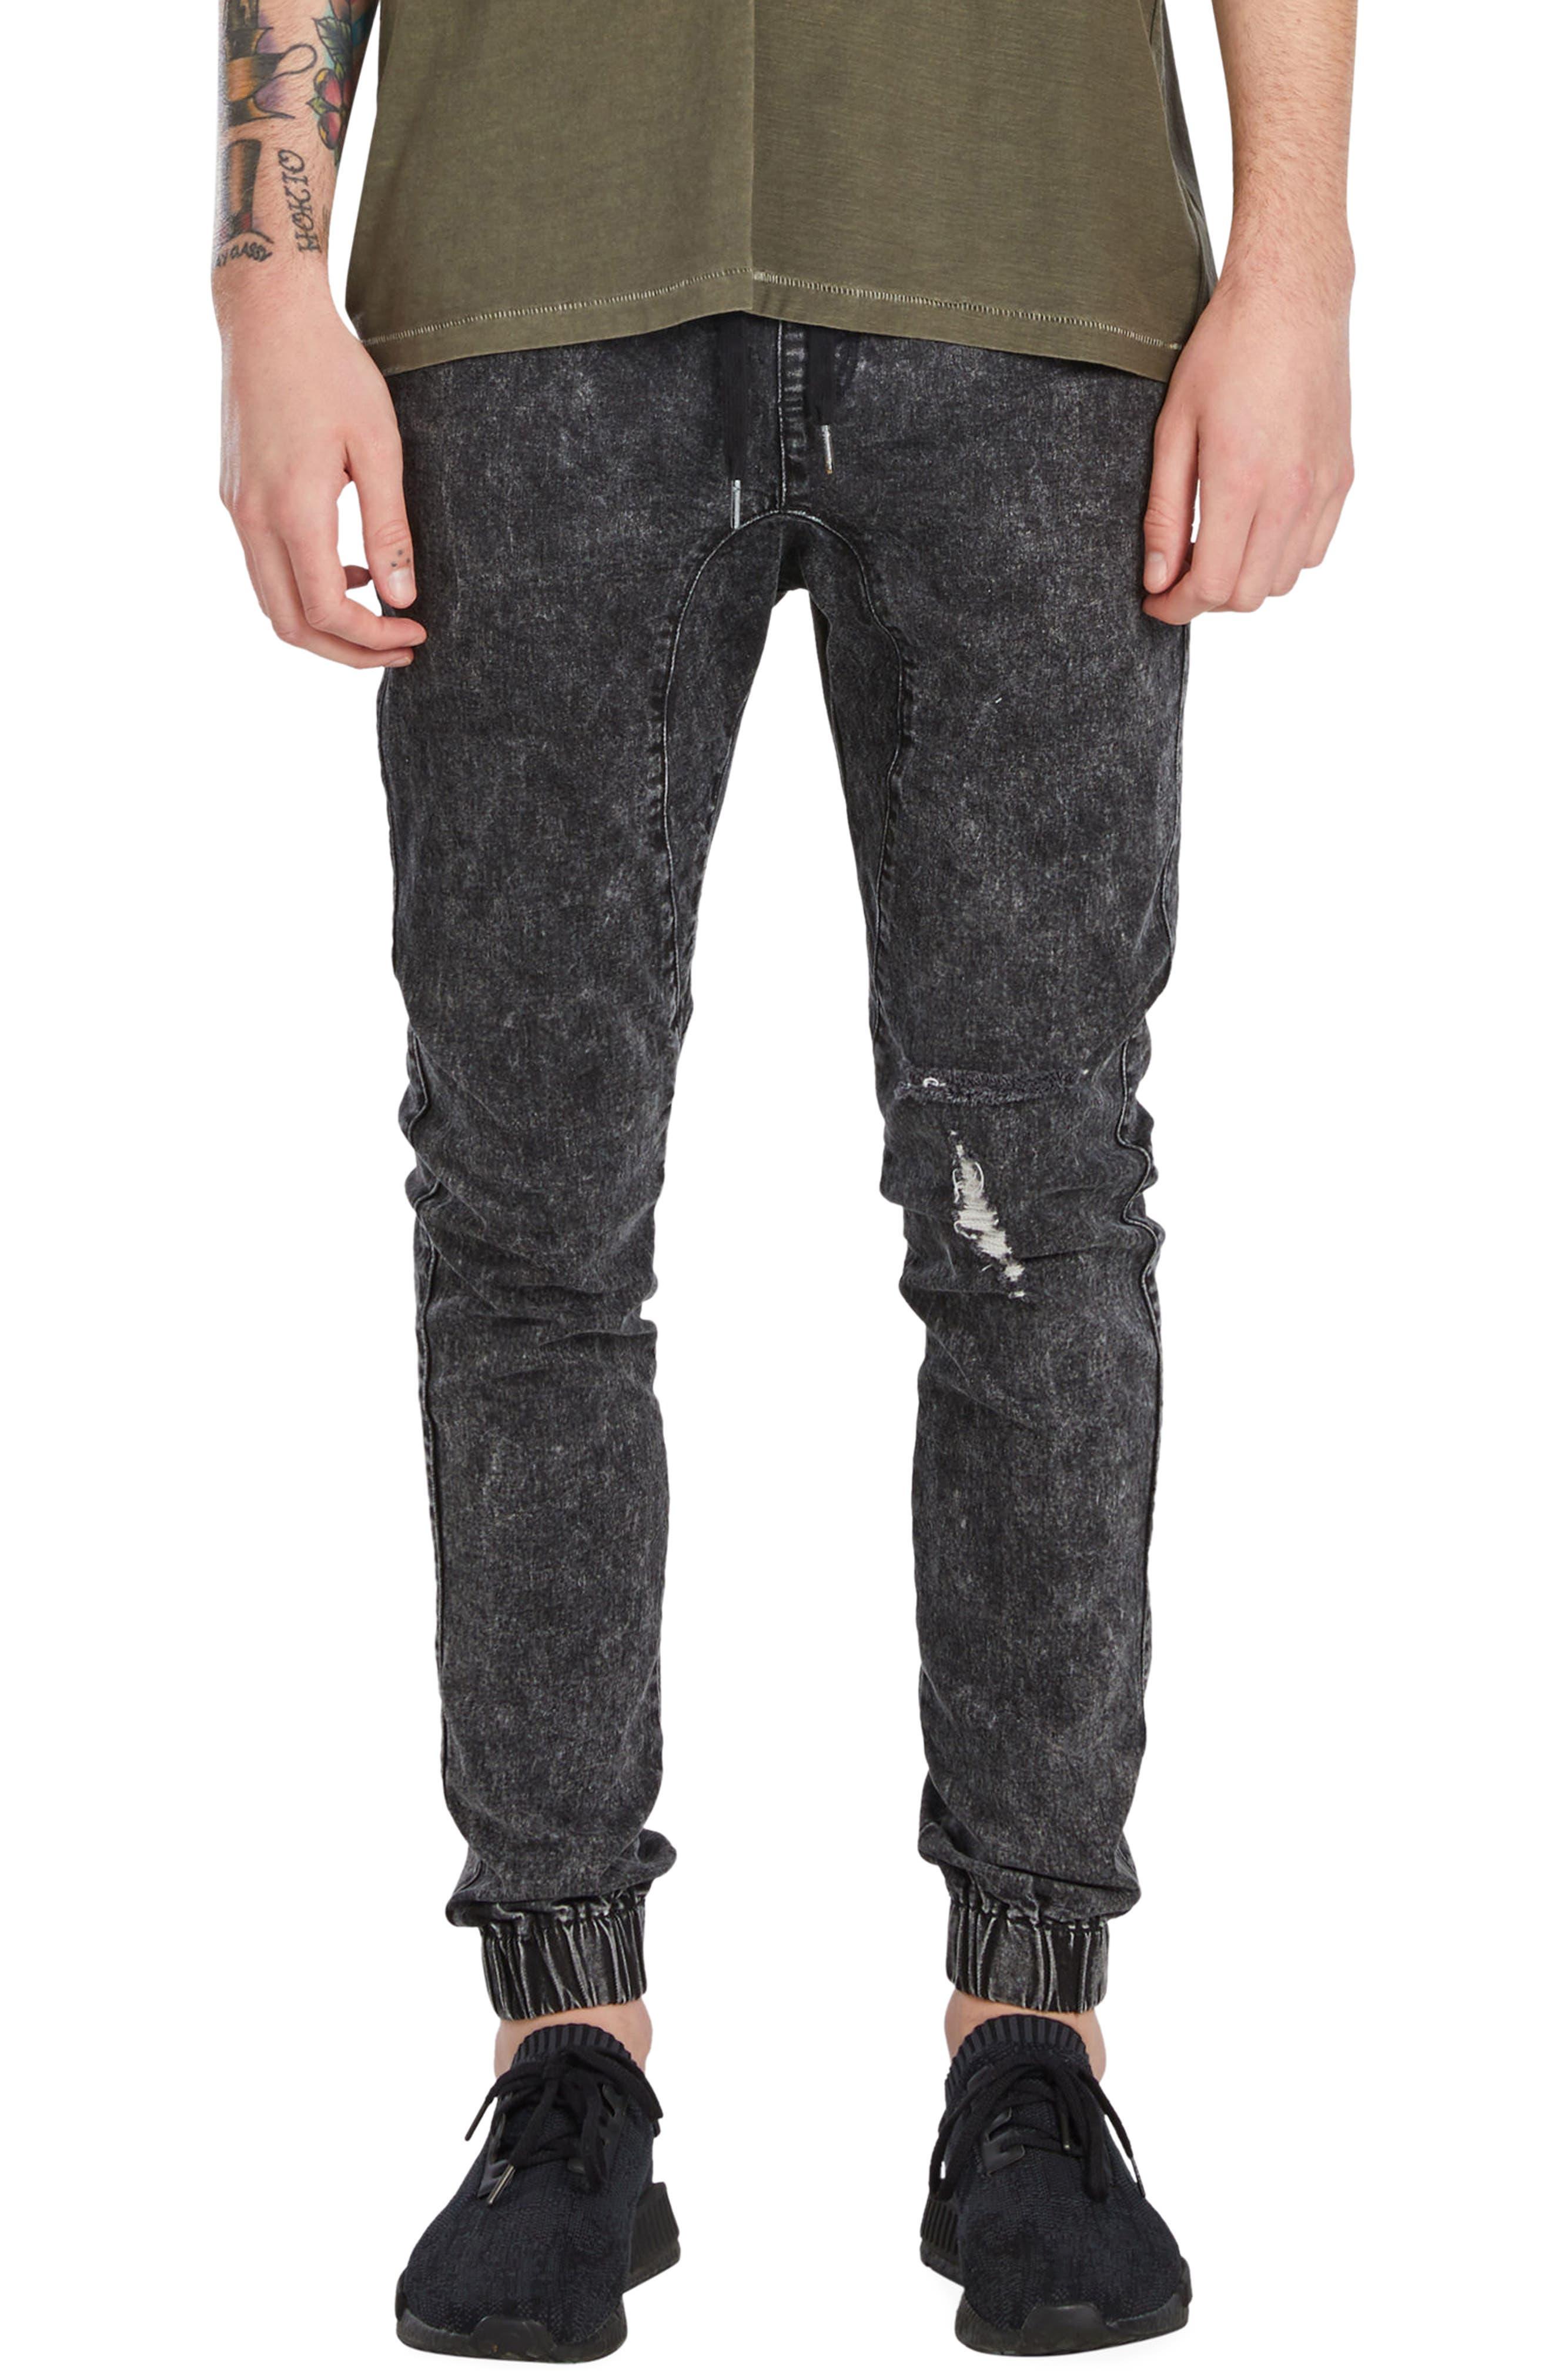 Sureshot Jogger Pants,                         Main,                         color, Black Acid Rip